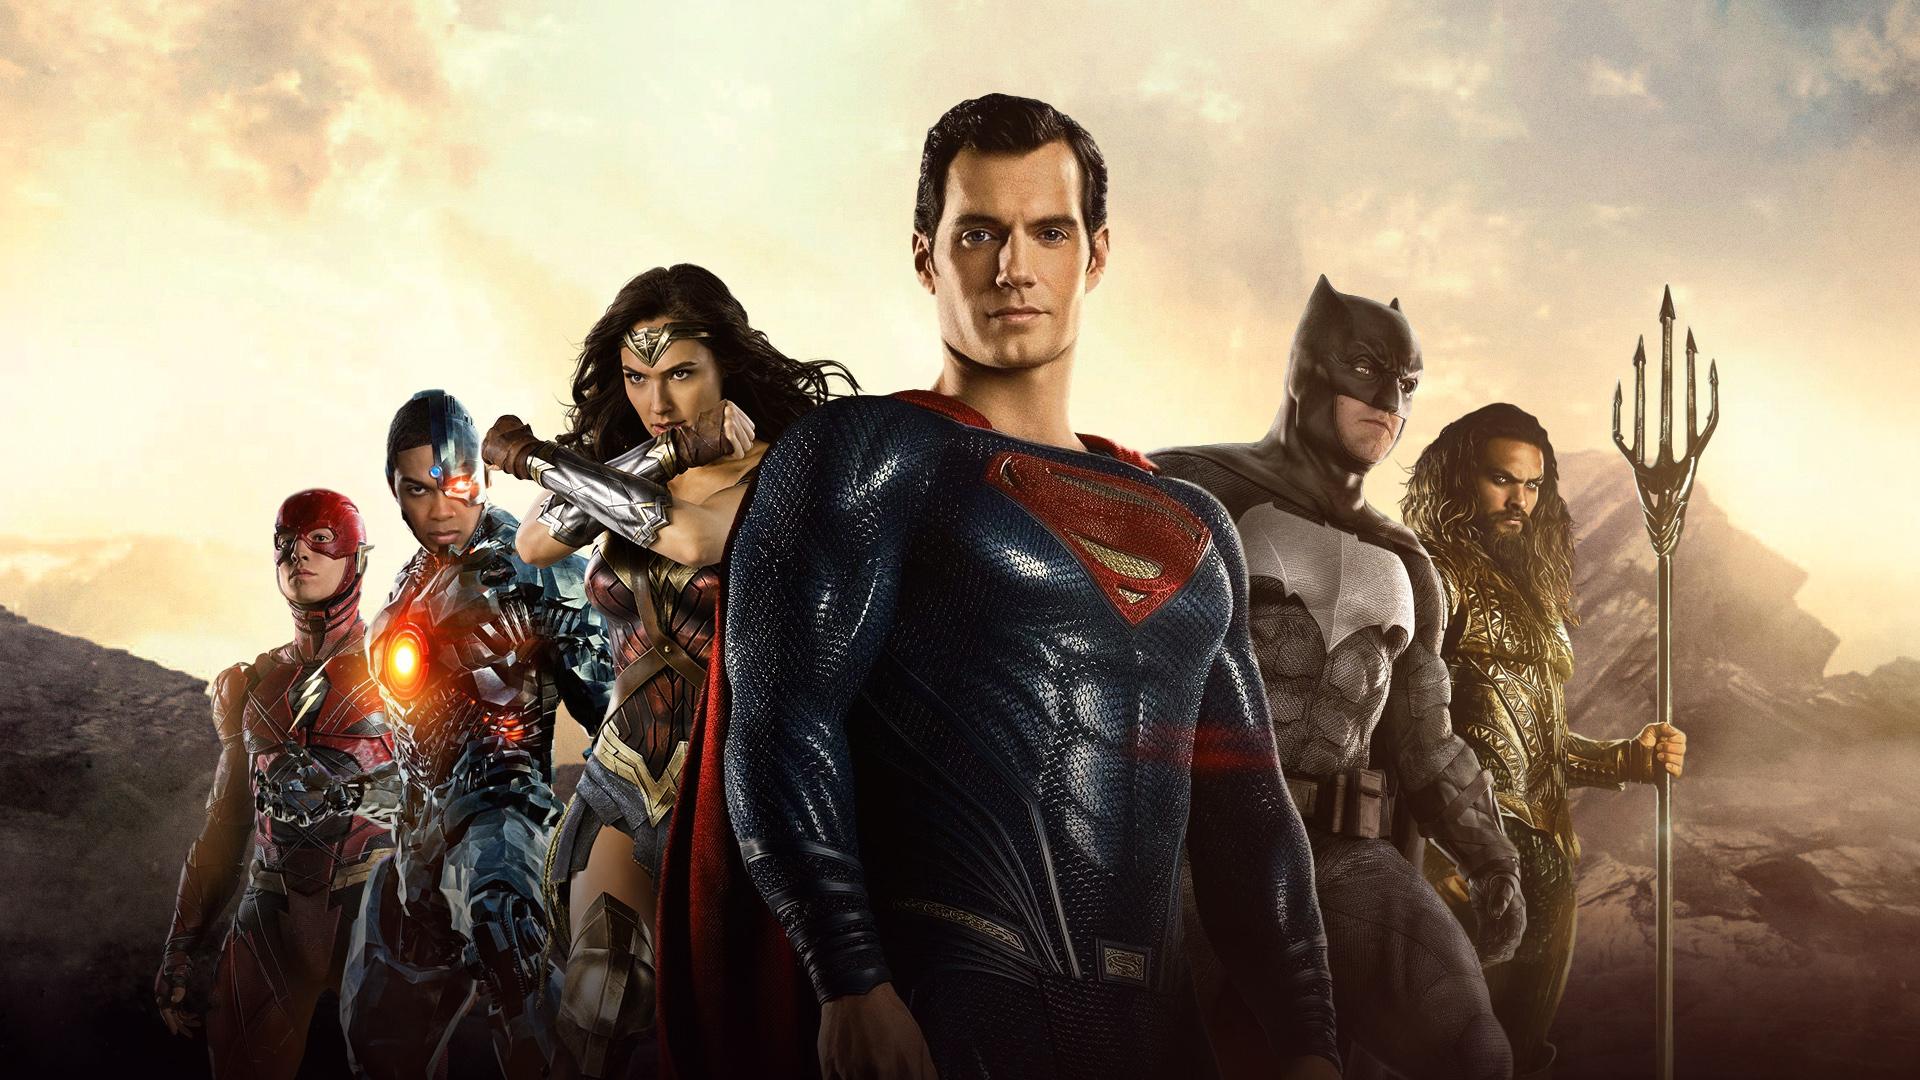 Wonder Woman Justice League 4k Fan Art Hd Movies 4k: 1600x900 Justice League 2017 Movie 1600x900 Resolution HD